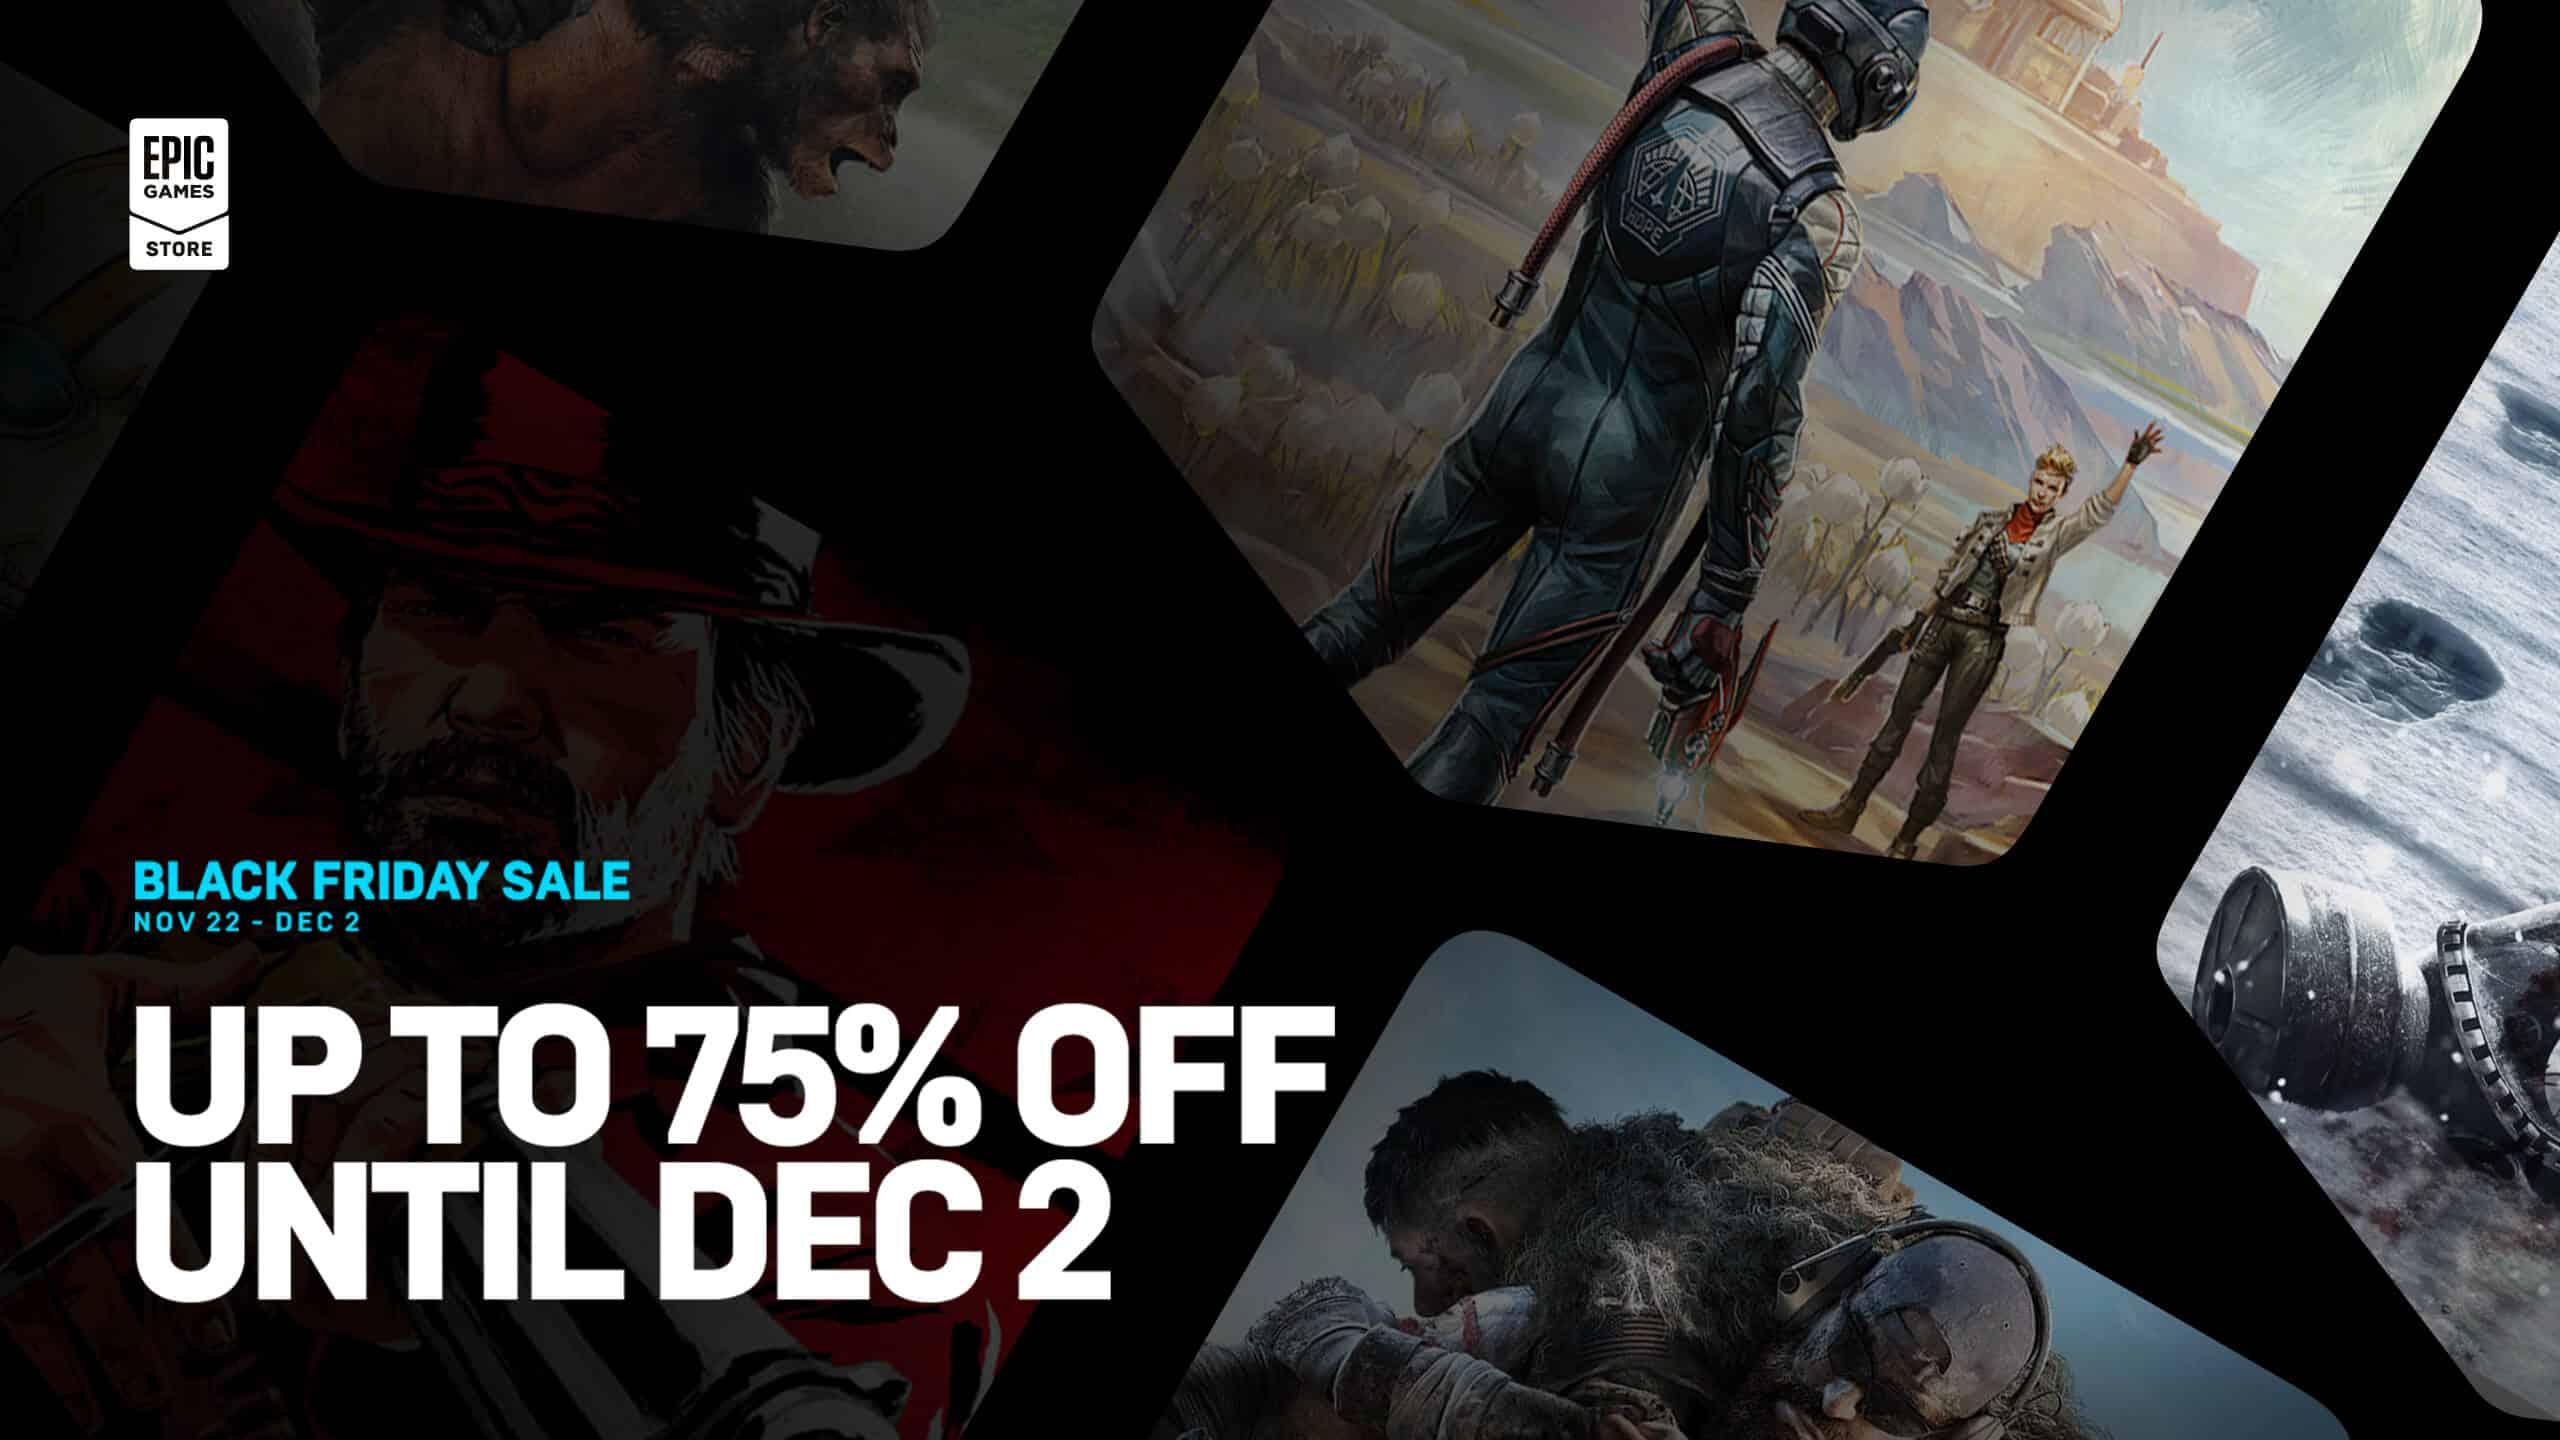 Epic Games Store Black Friday 2019 sale deals